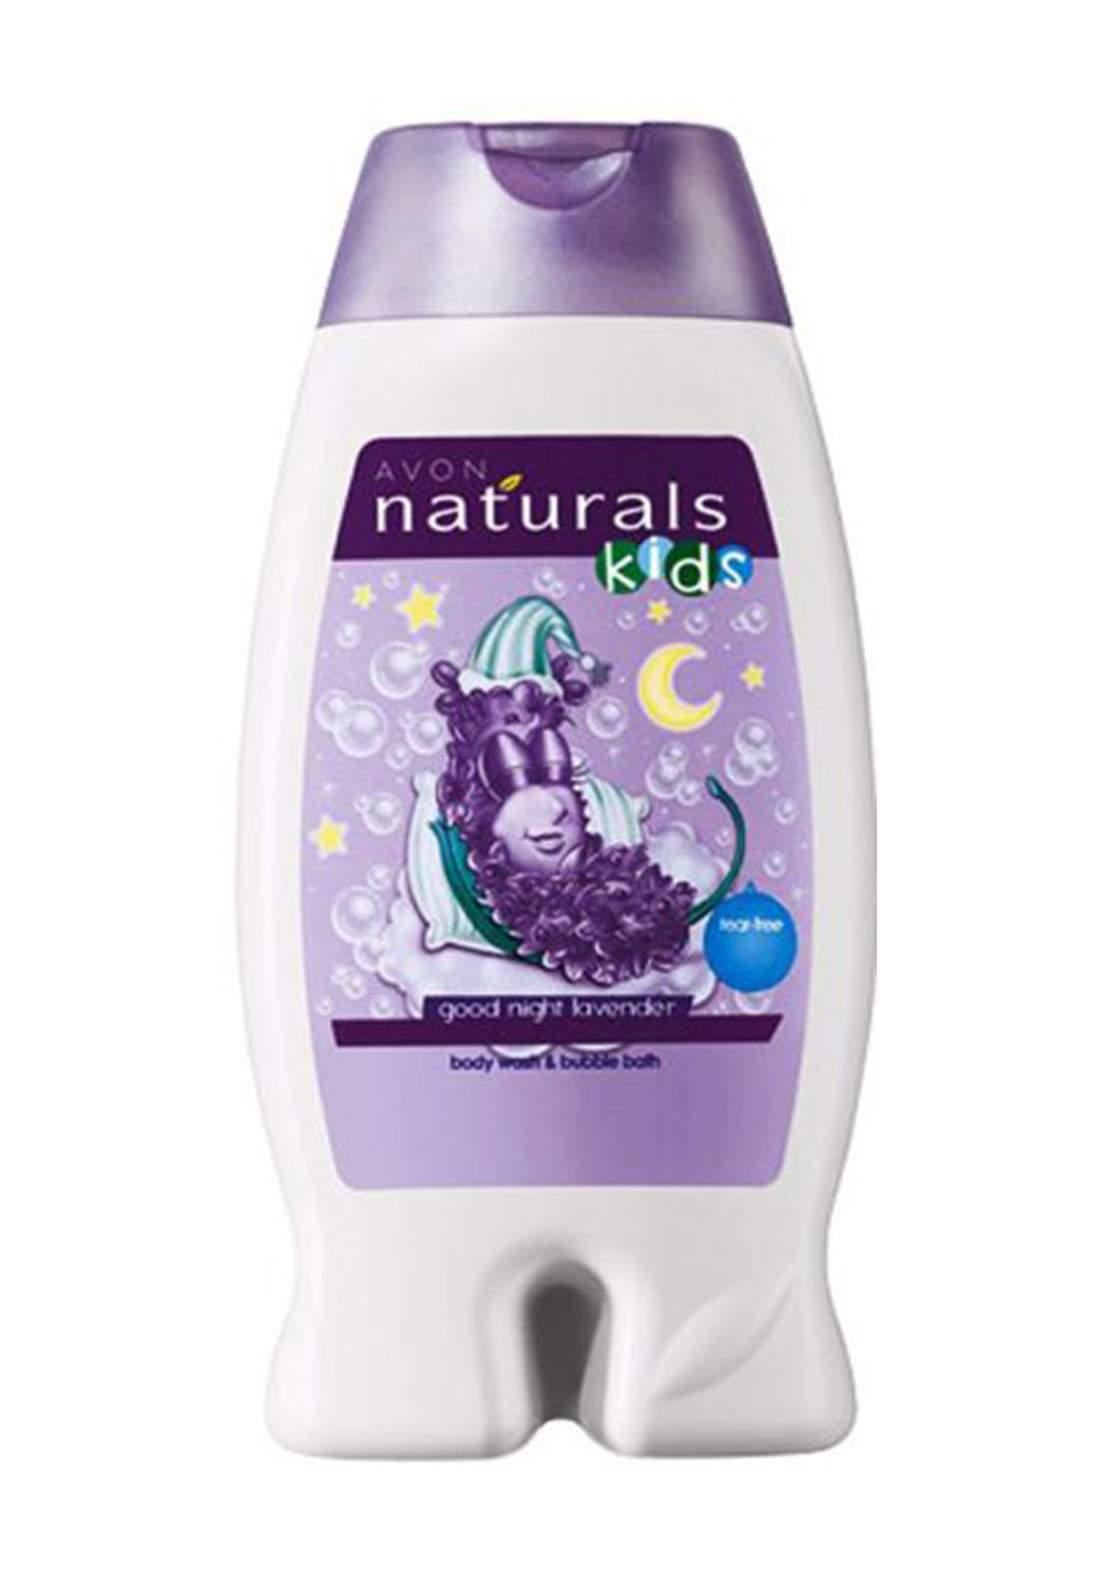 (328100)Avon Naturals Bubble Bath For Kids-Lavendar 250 ml فقاعات حوض الاستحمام للأطفال